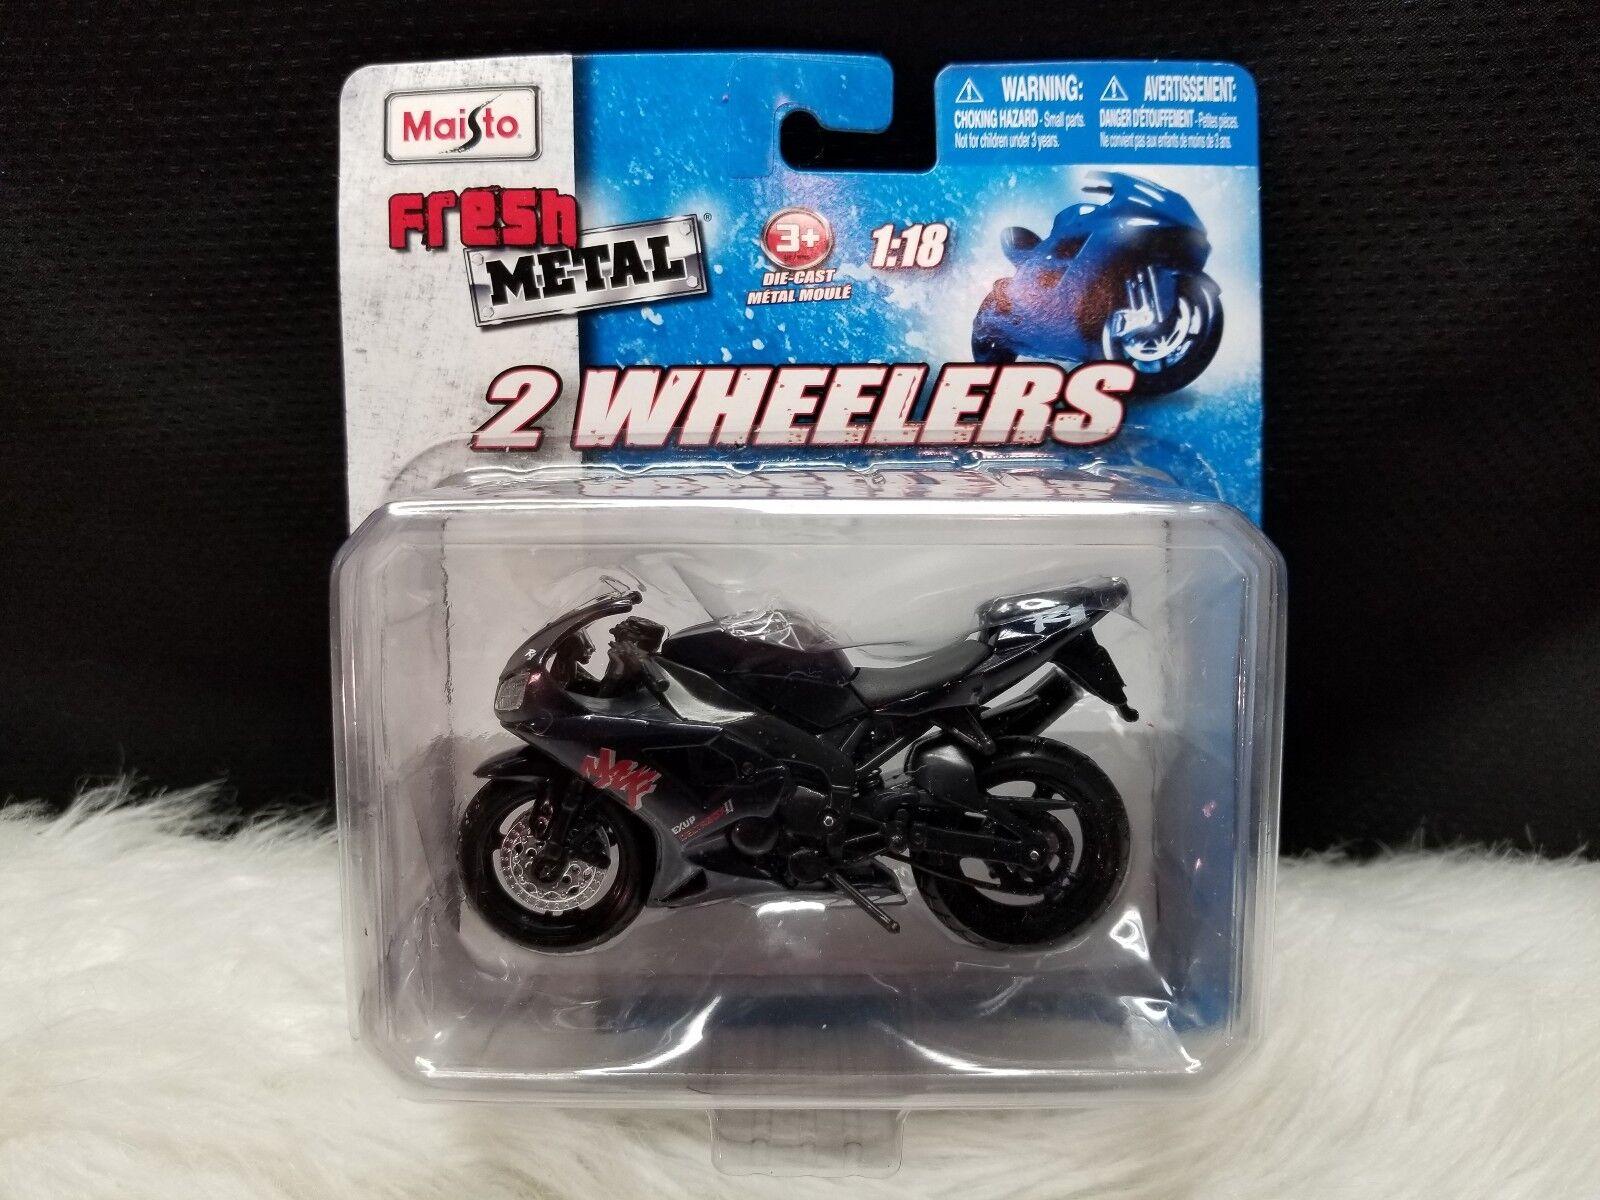 Maisto Fresh Metal Metal Metal 2 Wheelers Motorcycle ~ Aprilia 1:18 Scale Yamaha Exup 5df1cf